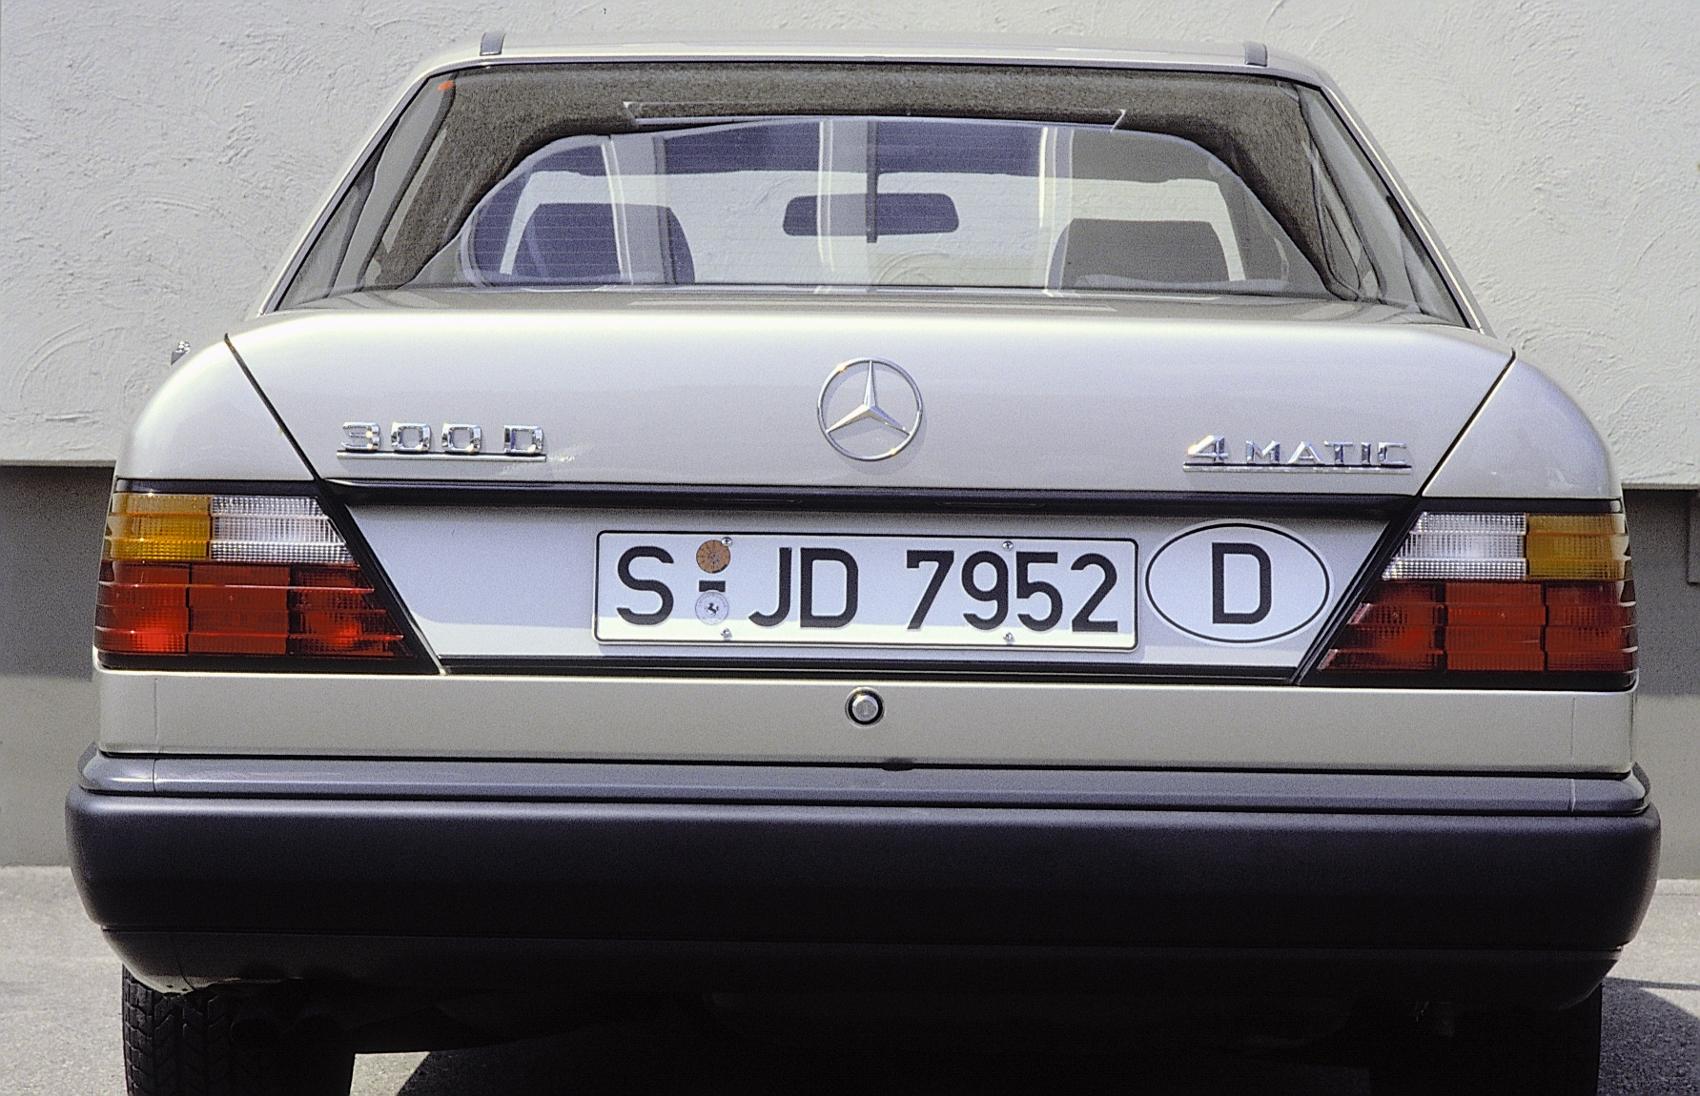 Návrat na autosalón IAA 1985: Mercedes predstavil nové systémy ASD, ASR a 4MATIC 7SqhP5qC0J 86f76-17